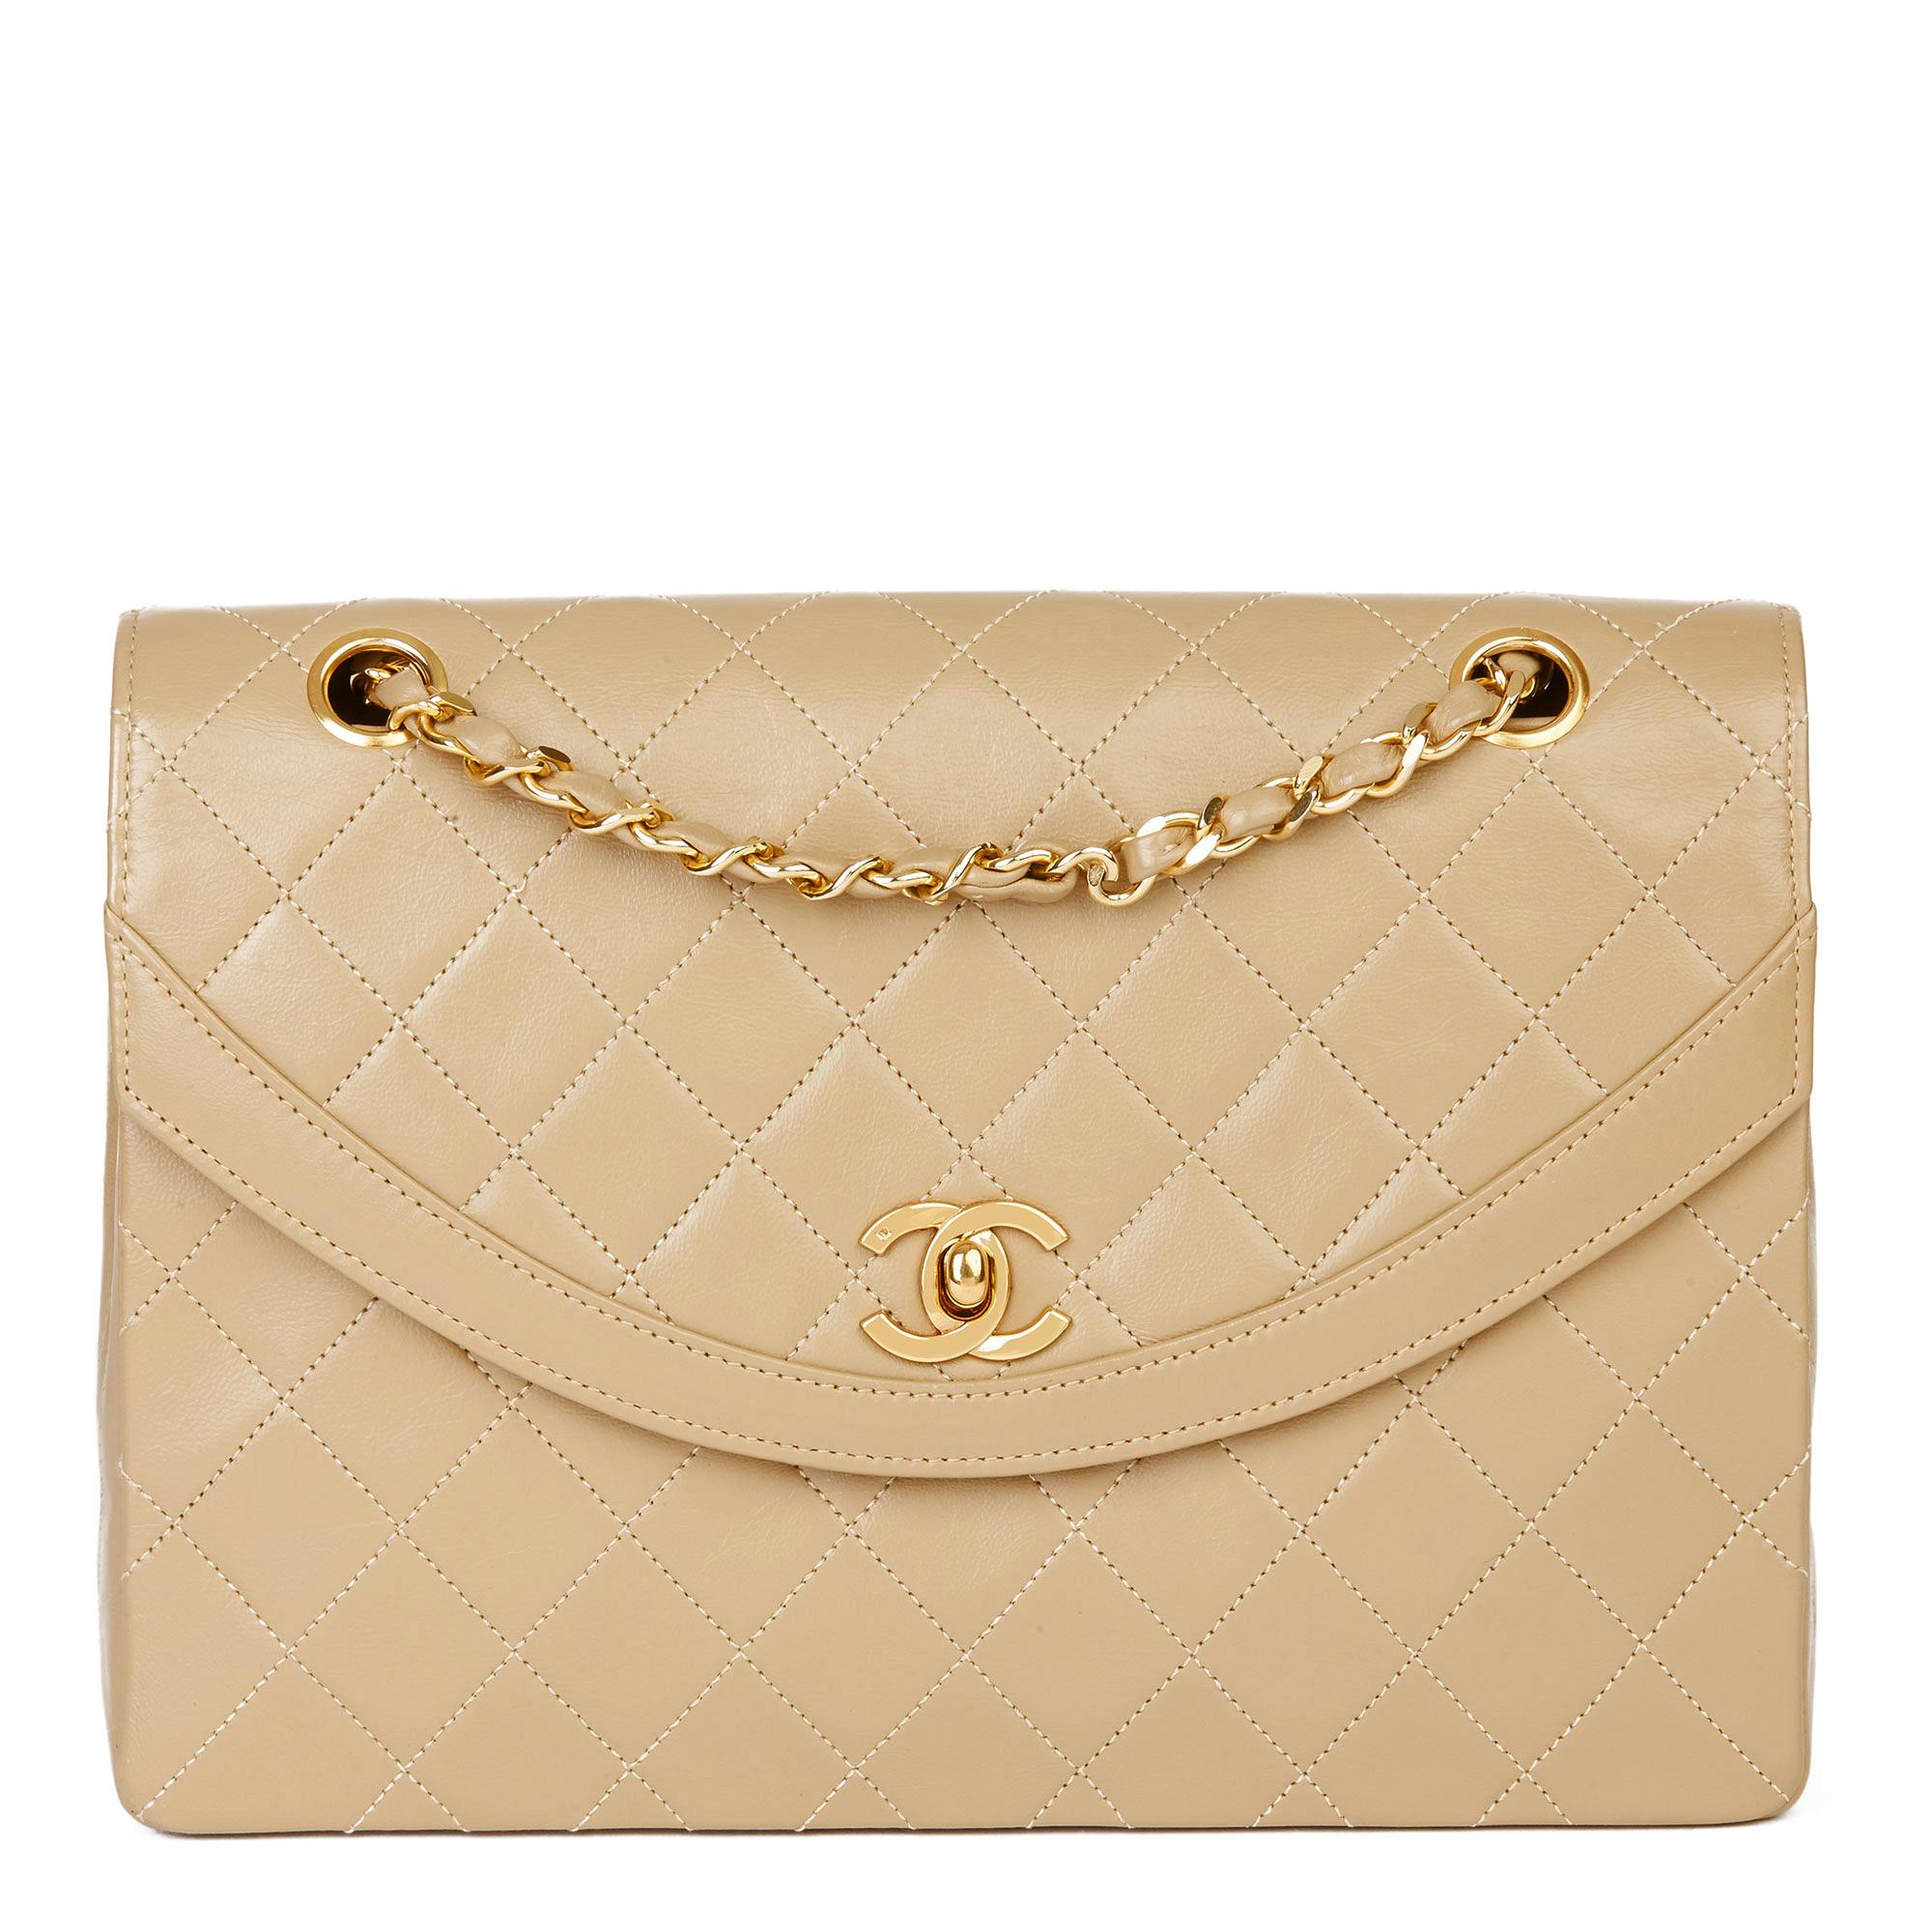 Chanel Dark Beige Quilted Lambskin Vintage Classic Single Flap Bag